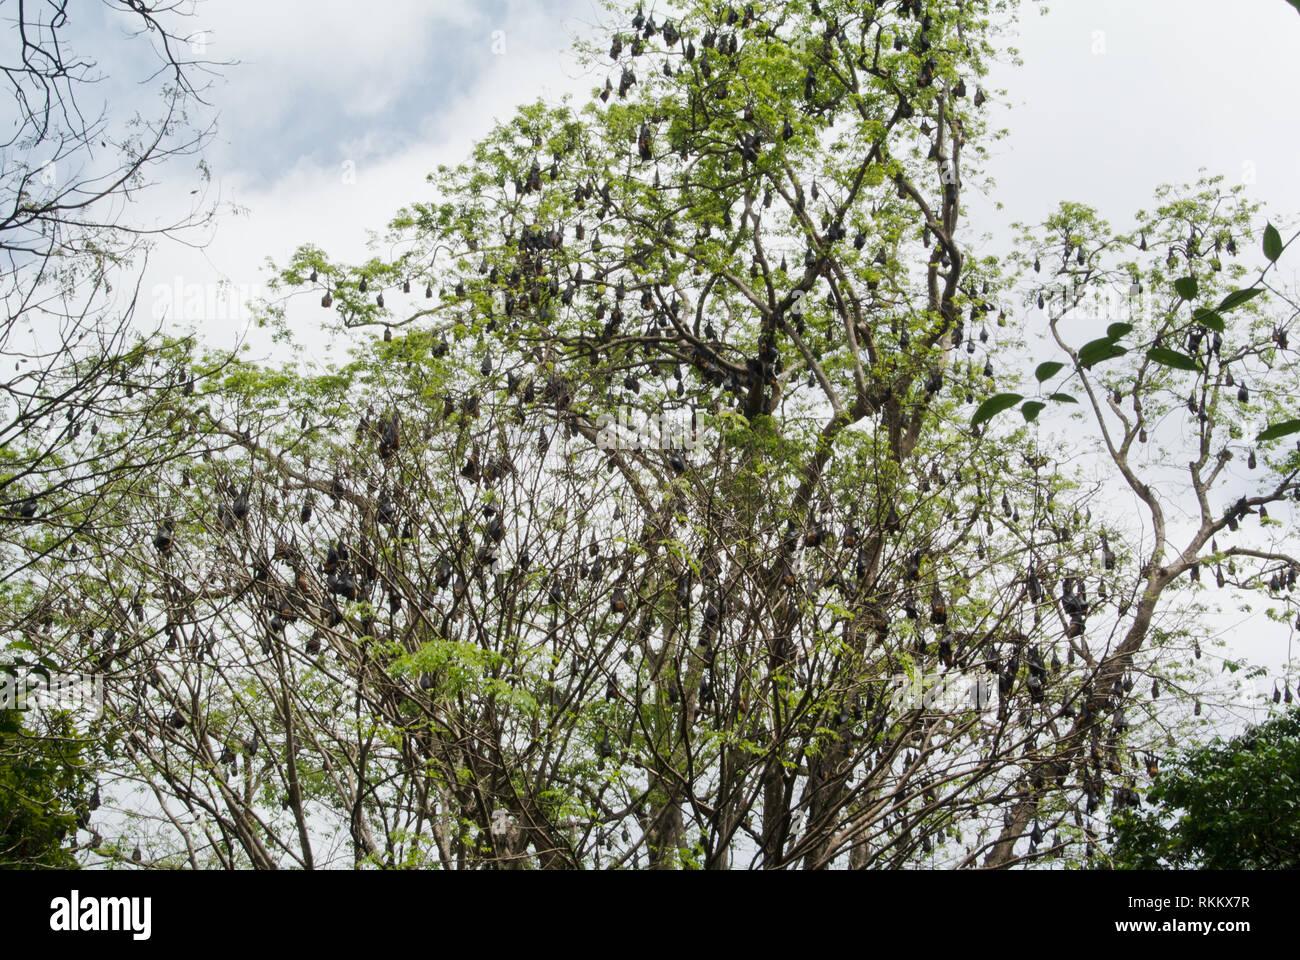 Fruit Bats in the Royal Botanical Gardens, Kandy, Sri Lanka Stock Photo